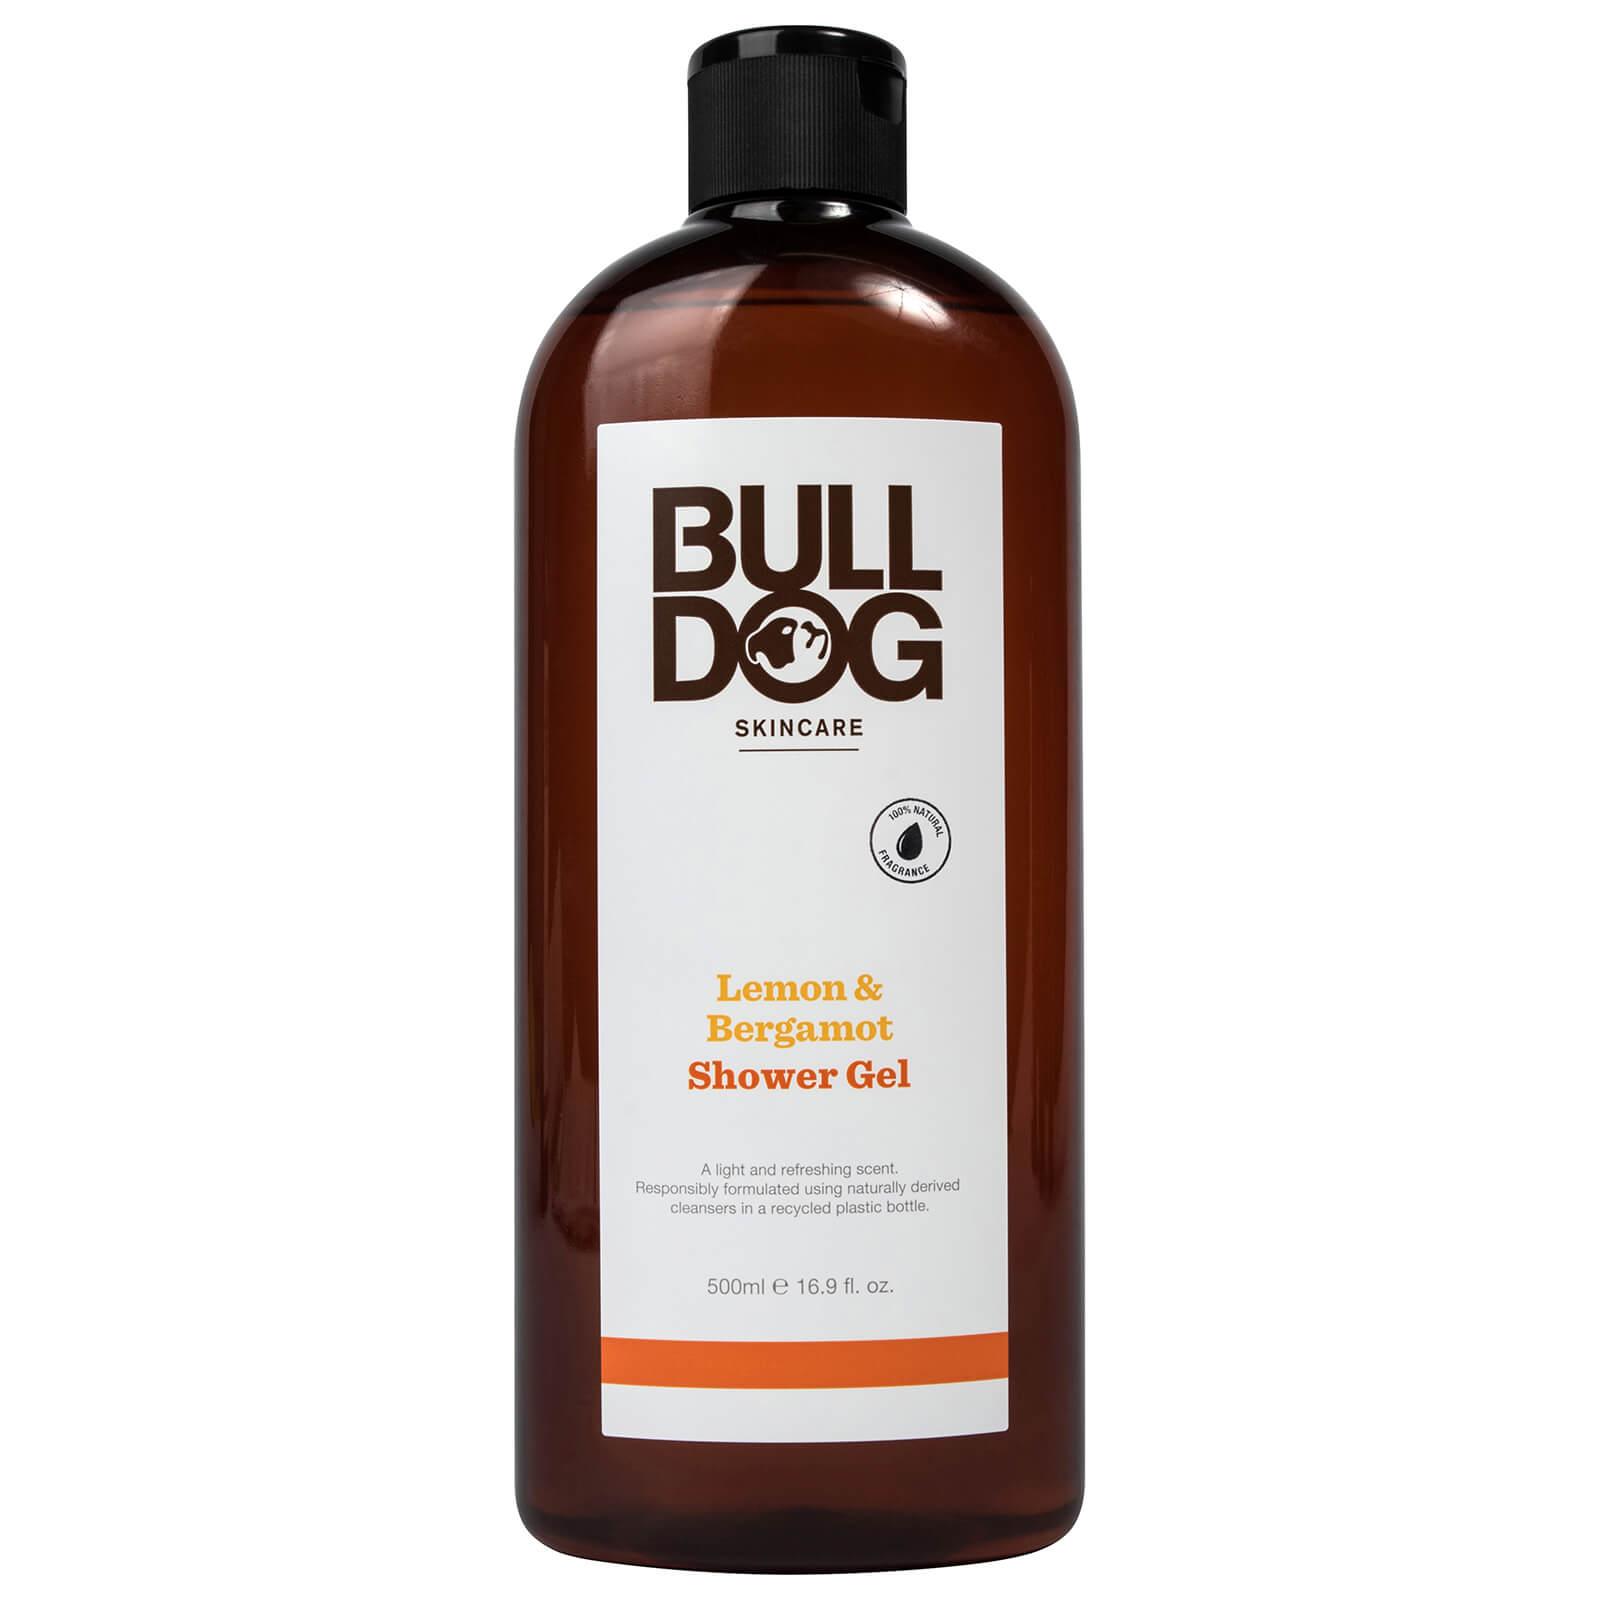 Купить Bulldog Lemon & Bergamot Shower Gel 500ml